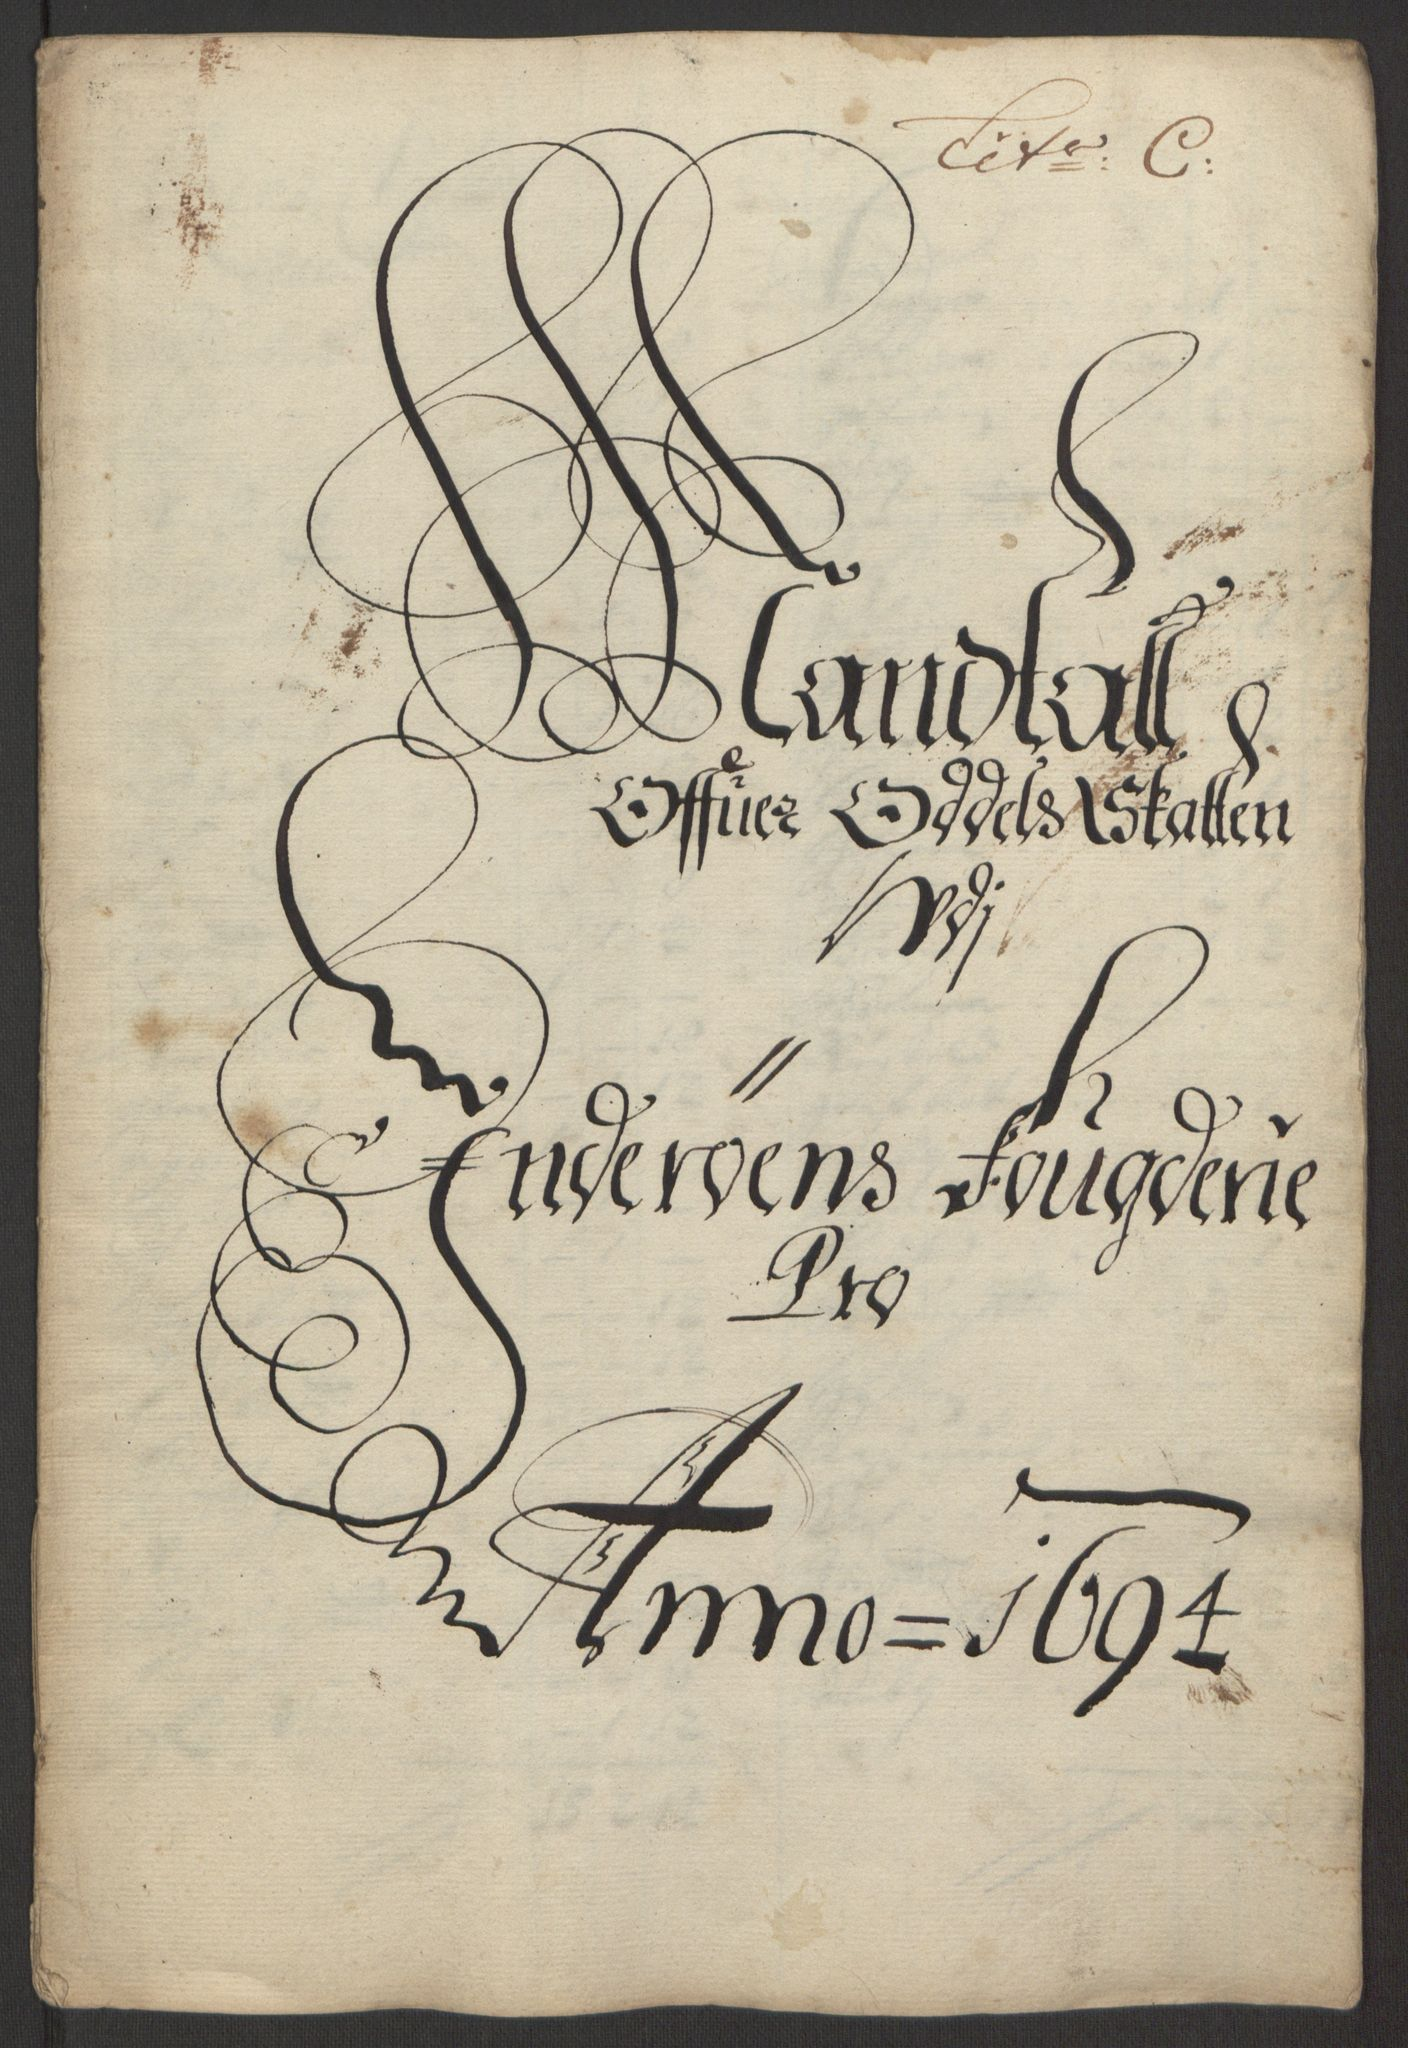 RA, Rentekammeret inntil 1814, Reviderte regnskaper, Fogderegnskap, R63/L4308: Fogderegnskap Inderøy, 1692-1694, s. 538